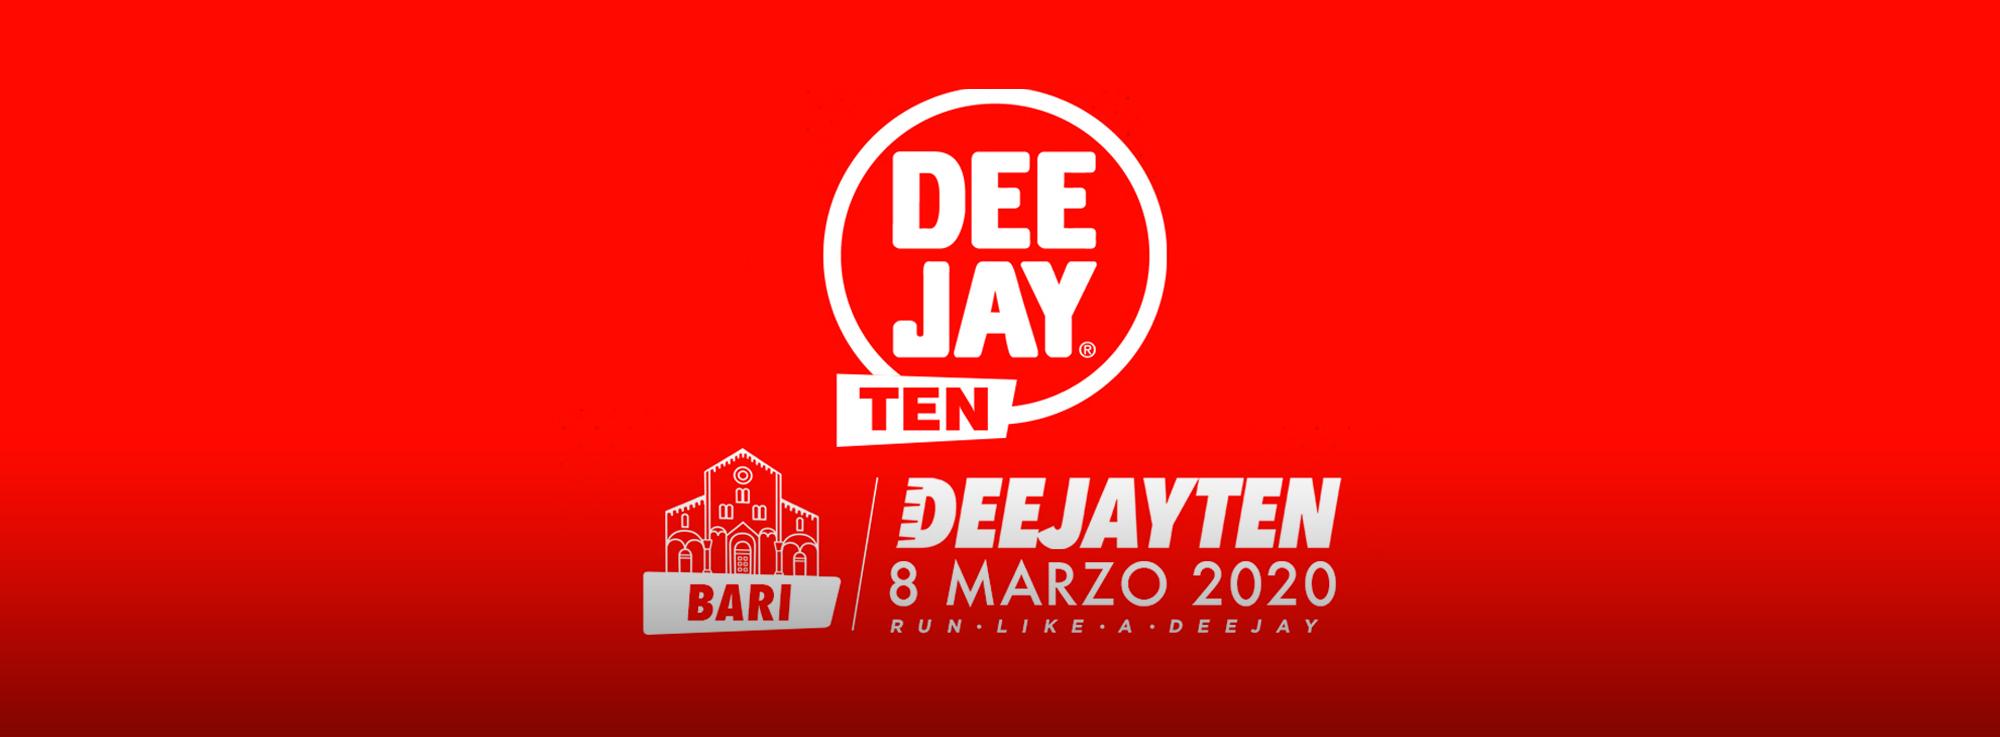 Bari: Deejay Ten